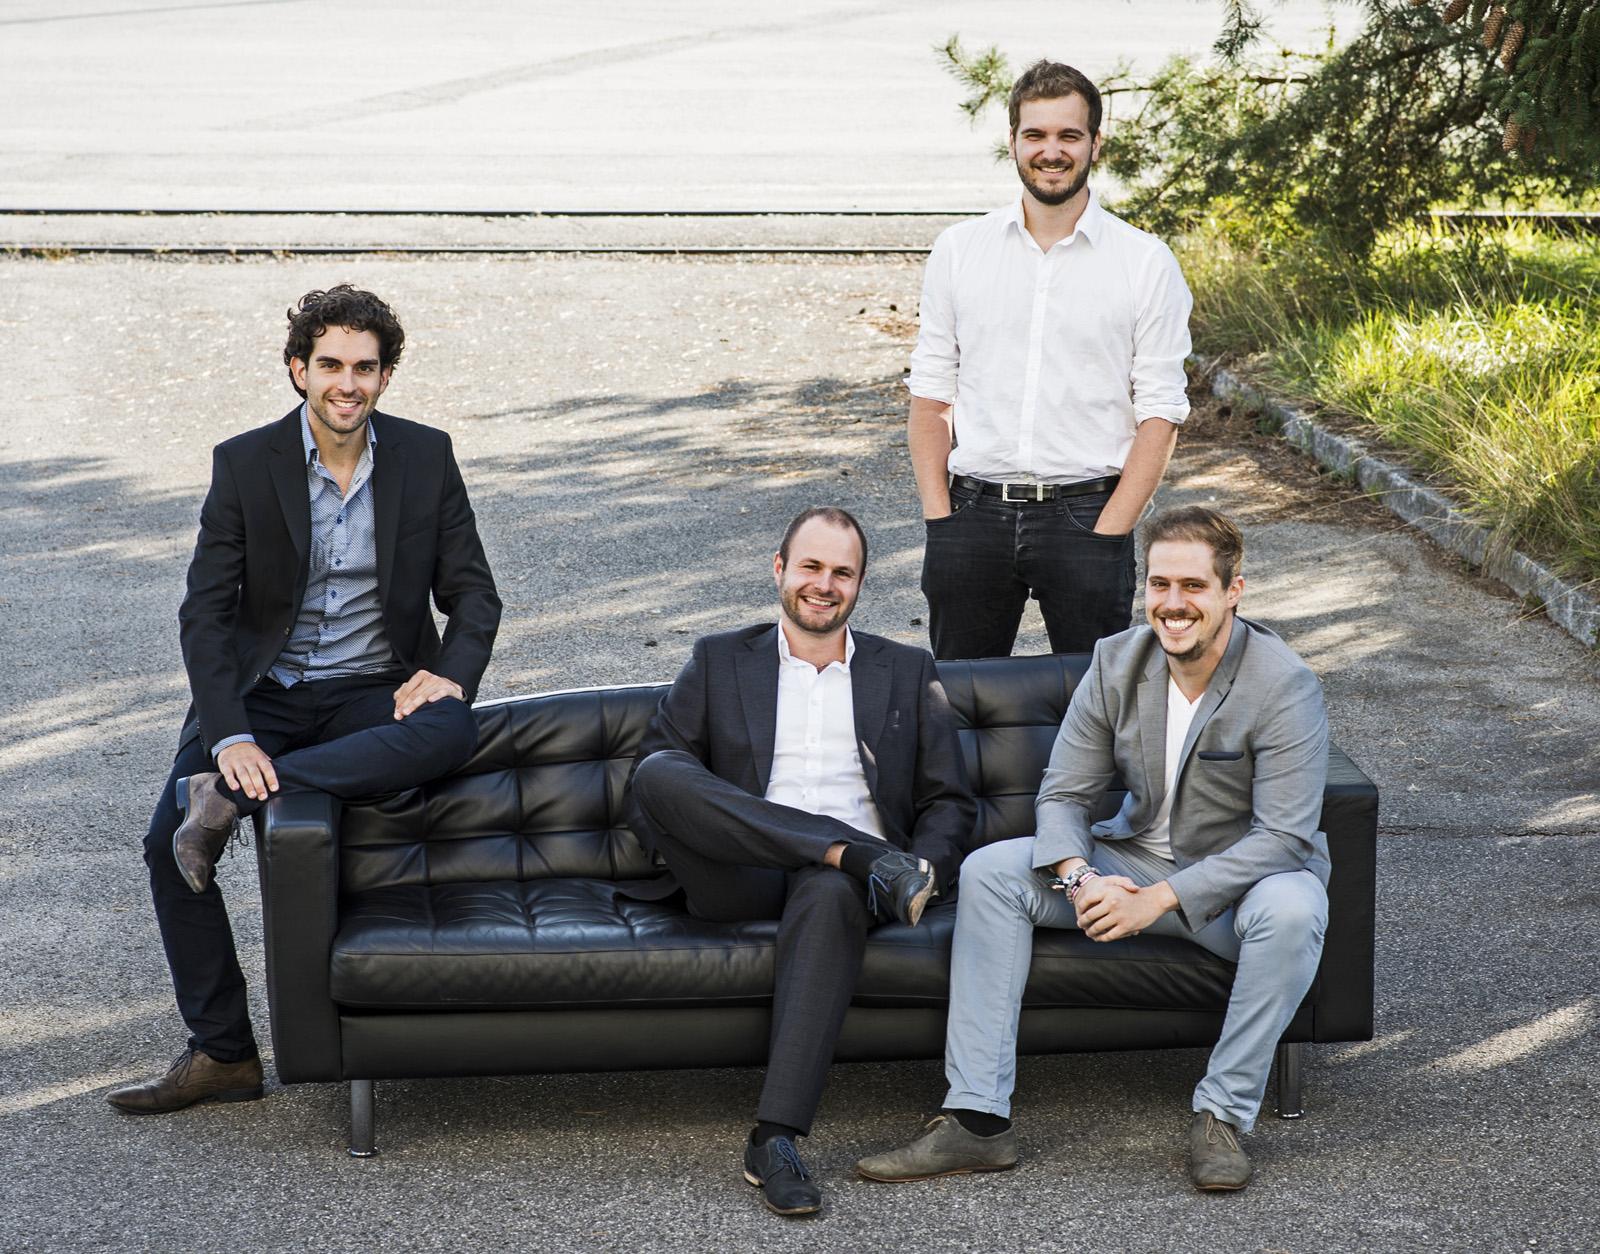 Spoluzakladatelé Lilium Daniel Wiegand, Sebastian Born, Patrick Nathen a Matthias Meiner